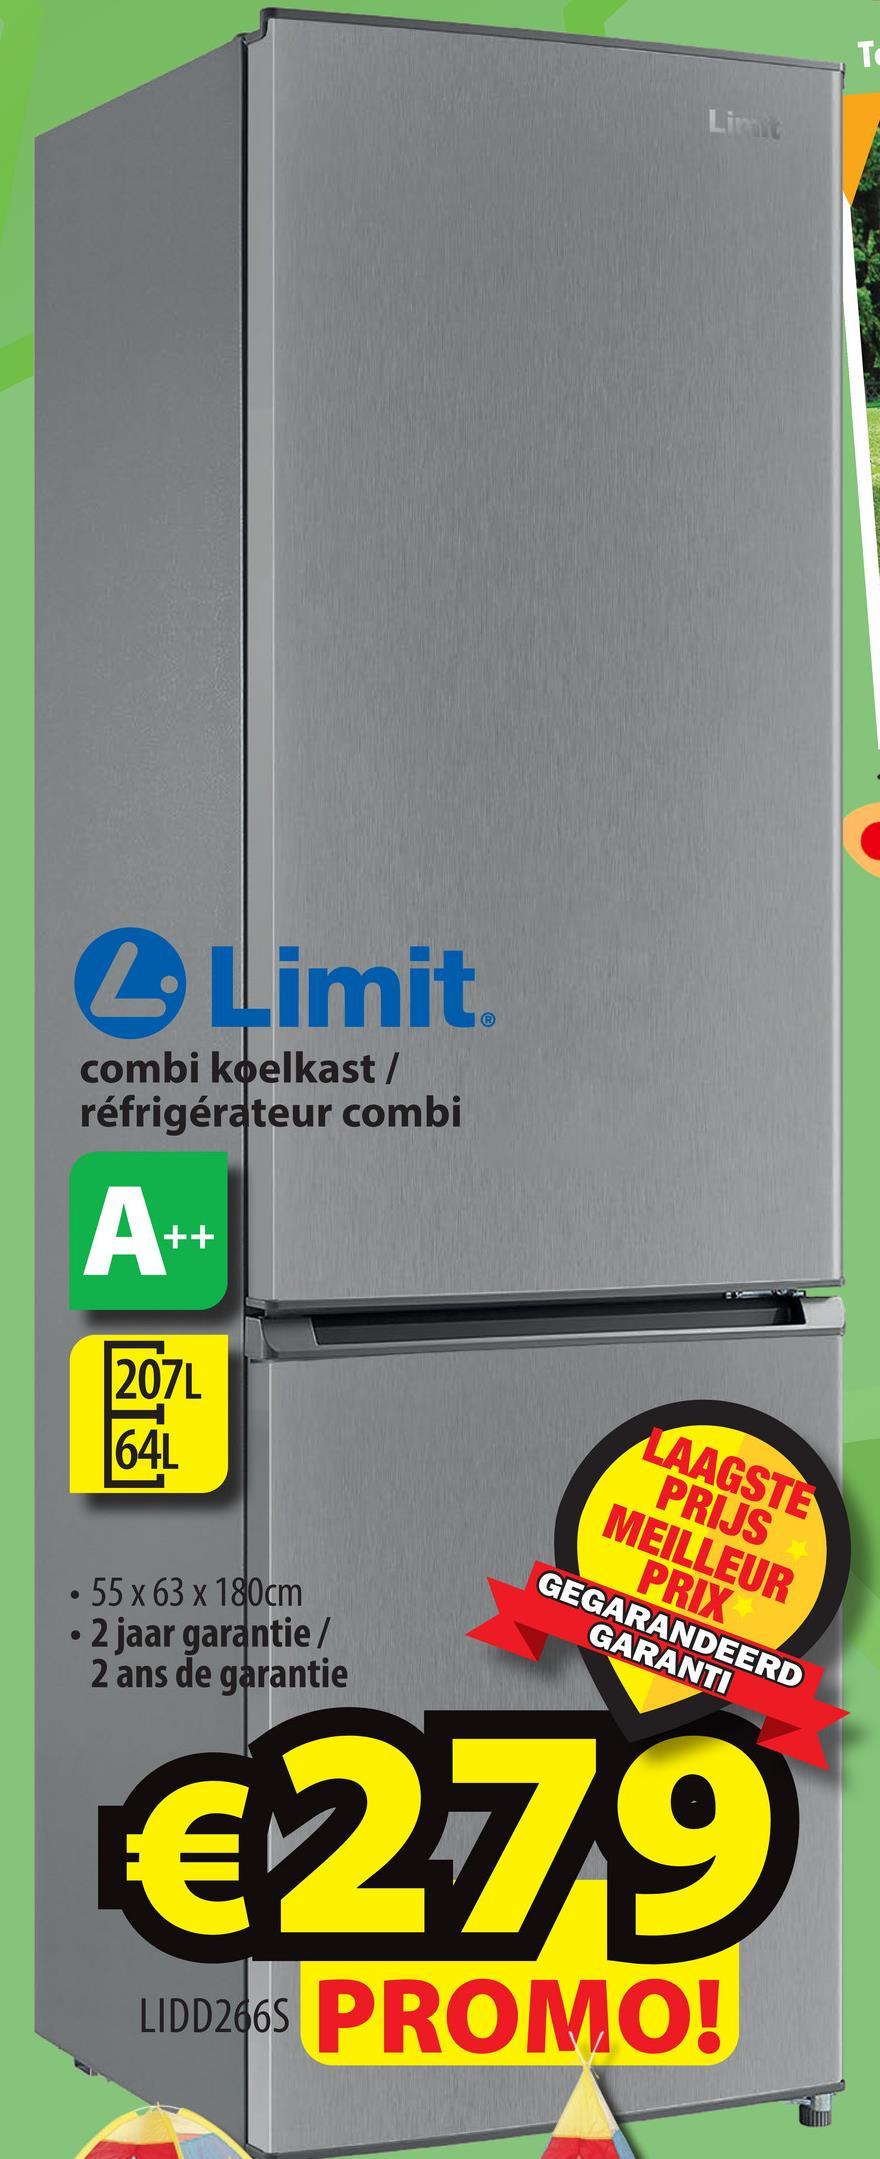 TO Lima L Limit combi koelkast / réfrigérateur combi A+ ++ 207L 64L LAAGSTE PRIJS MEILLEUR PRIX GEGARANDEERD GARANTI 55 x 63 x 180cm • 2 jaar garantie / 2 ans de garantie €279 LIDD286 PROMO!